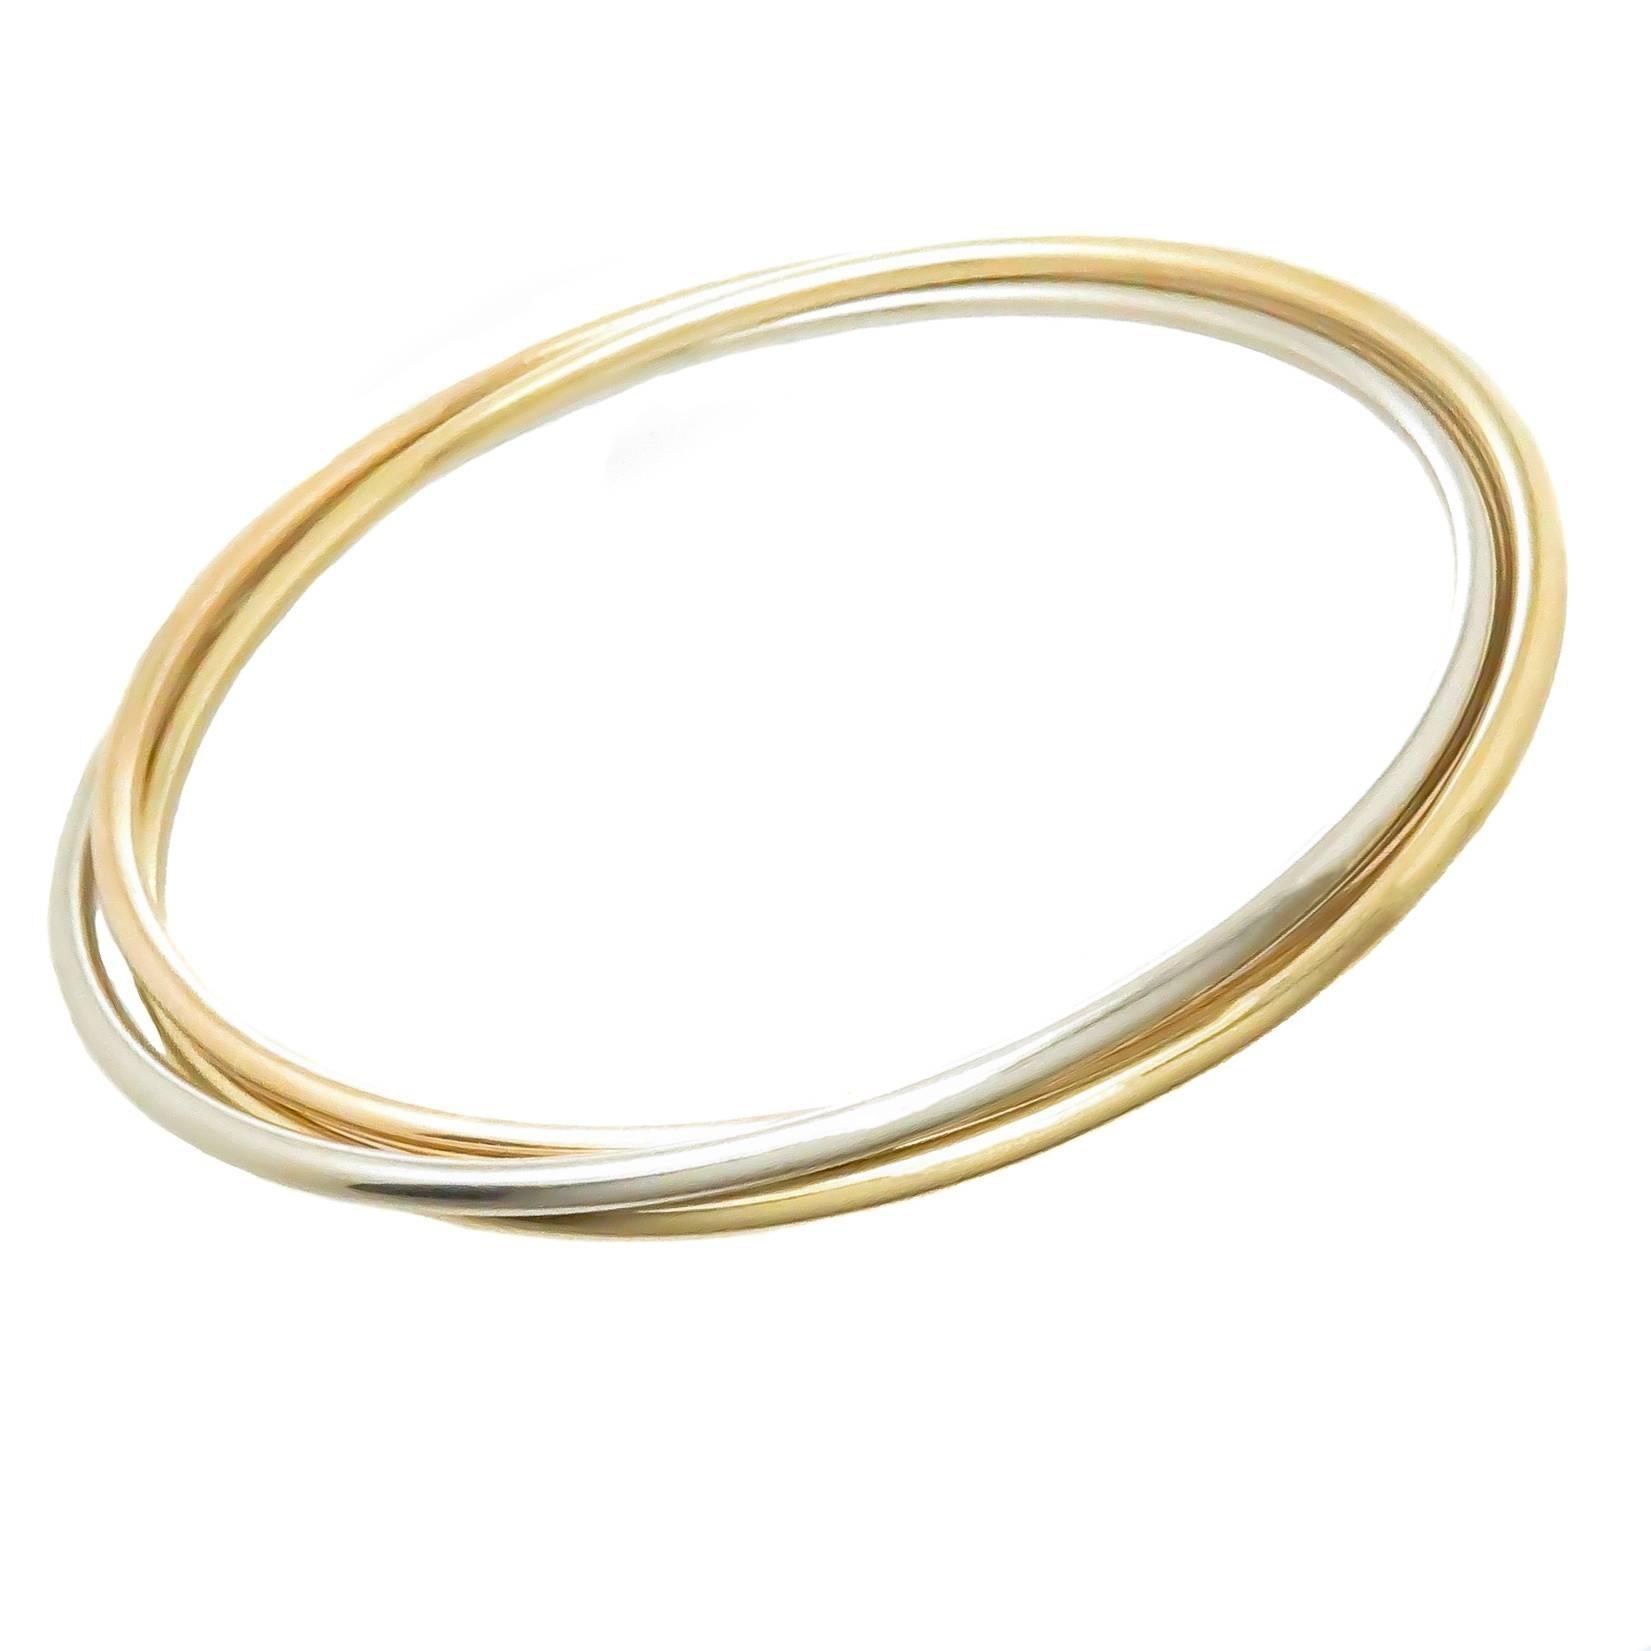 Cartier Trinity Tri Color Gold Bangle Bracelet, 1980